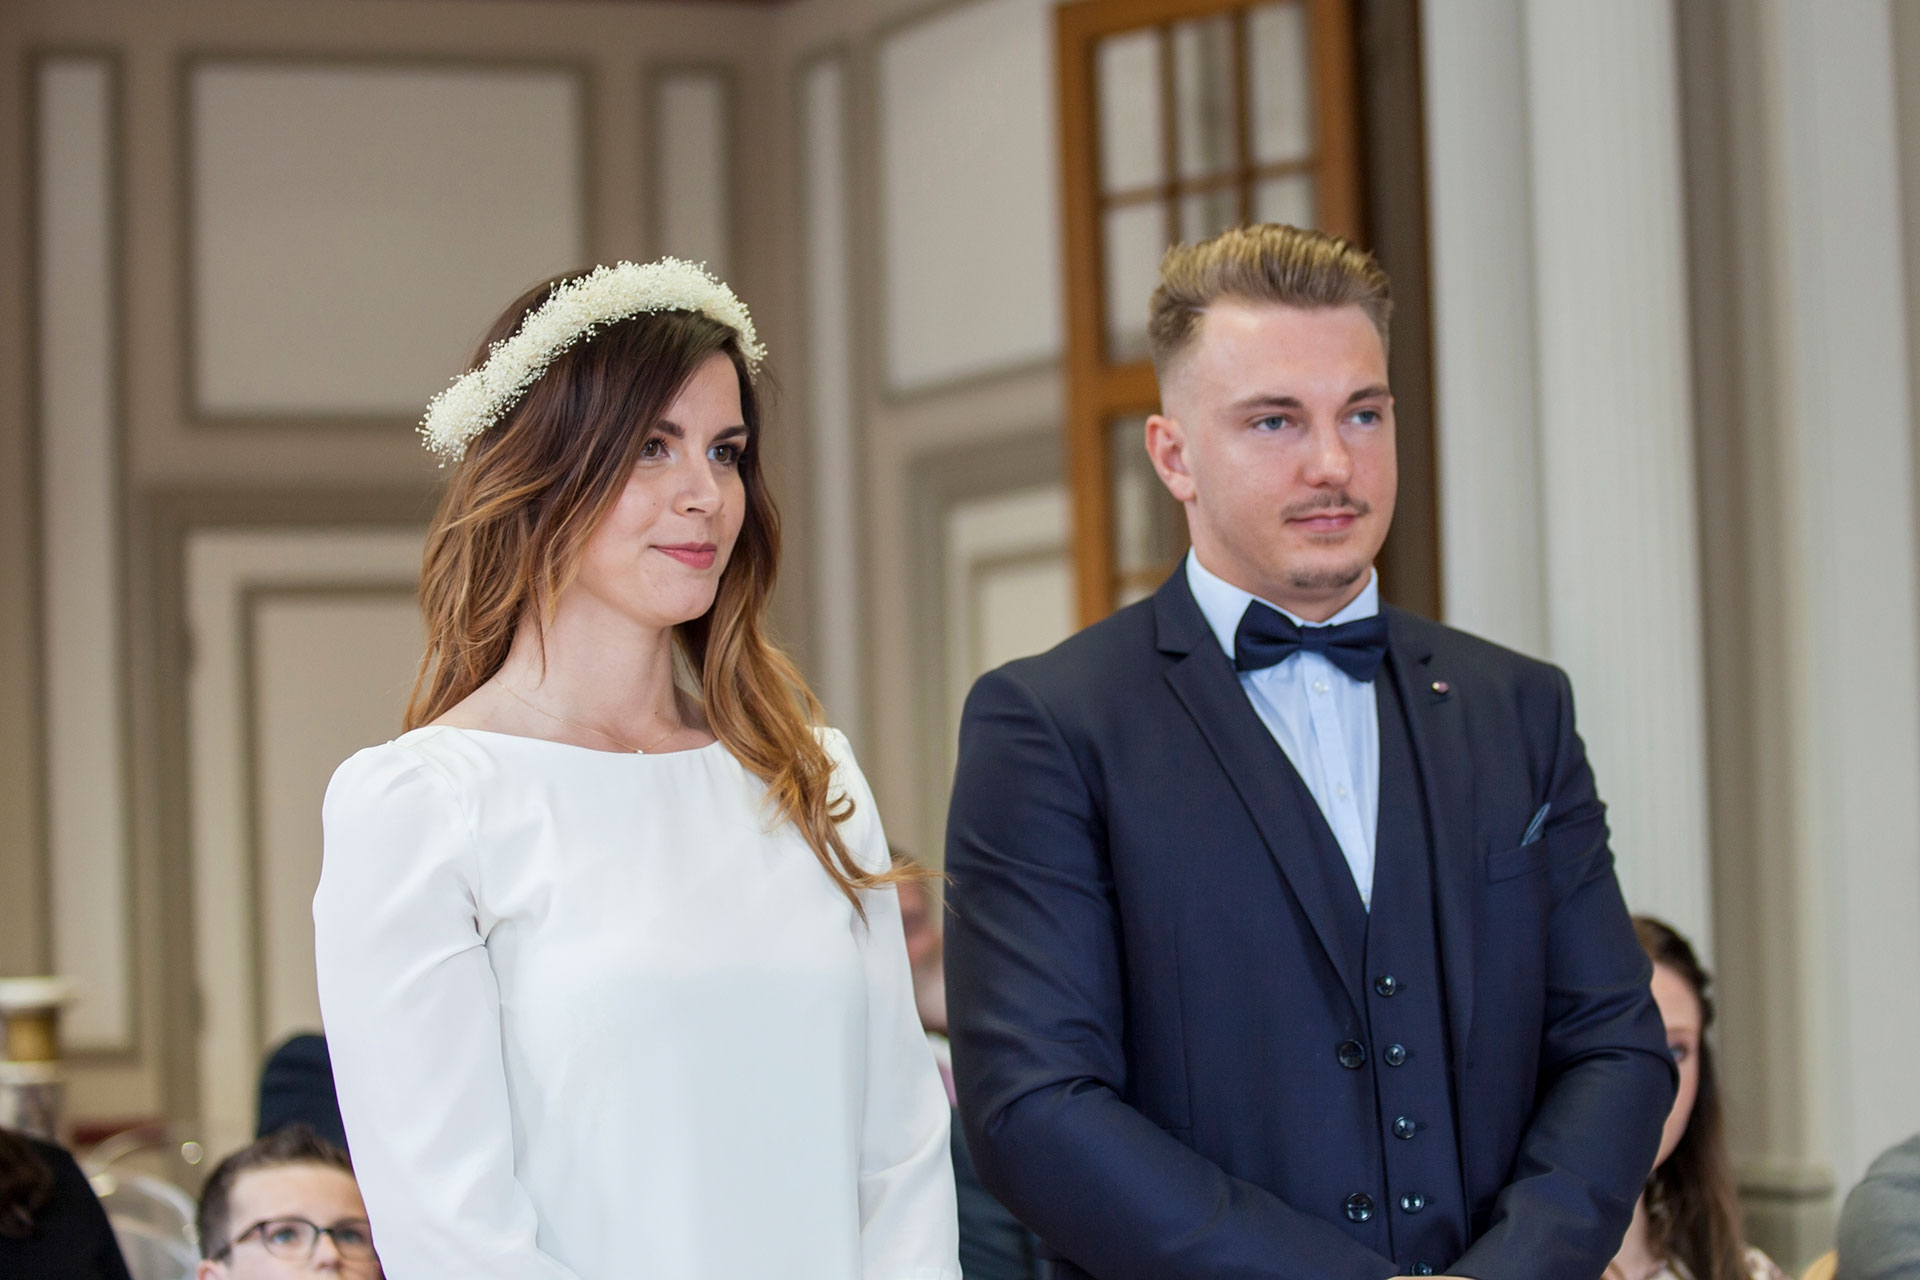 particuliers-evenements-mariages-oui-zelie&valentin-01